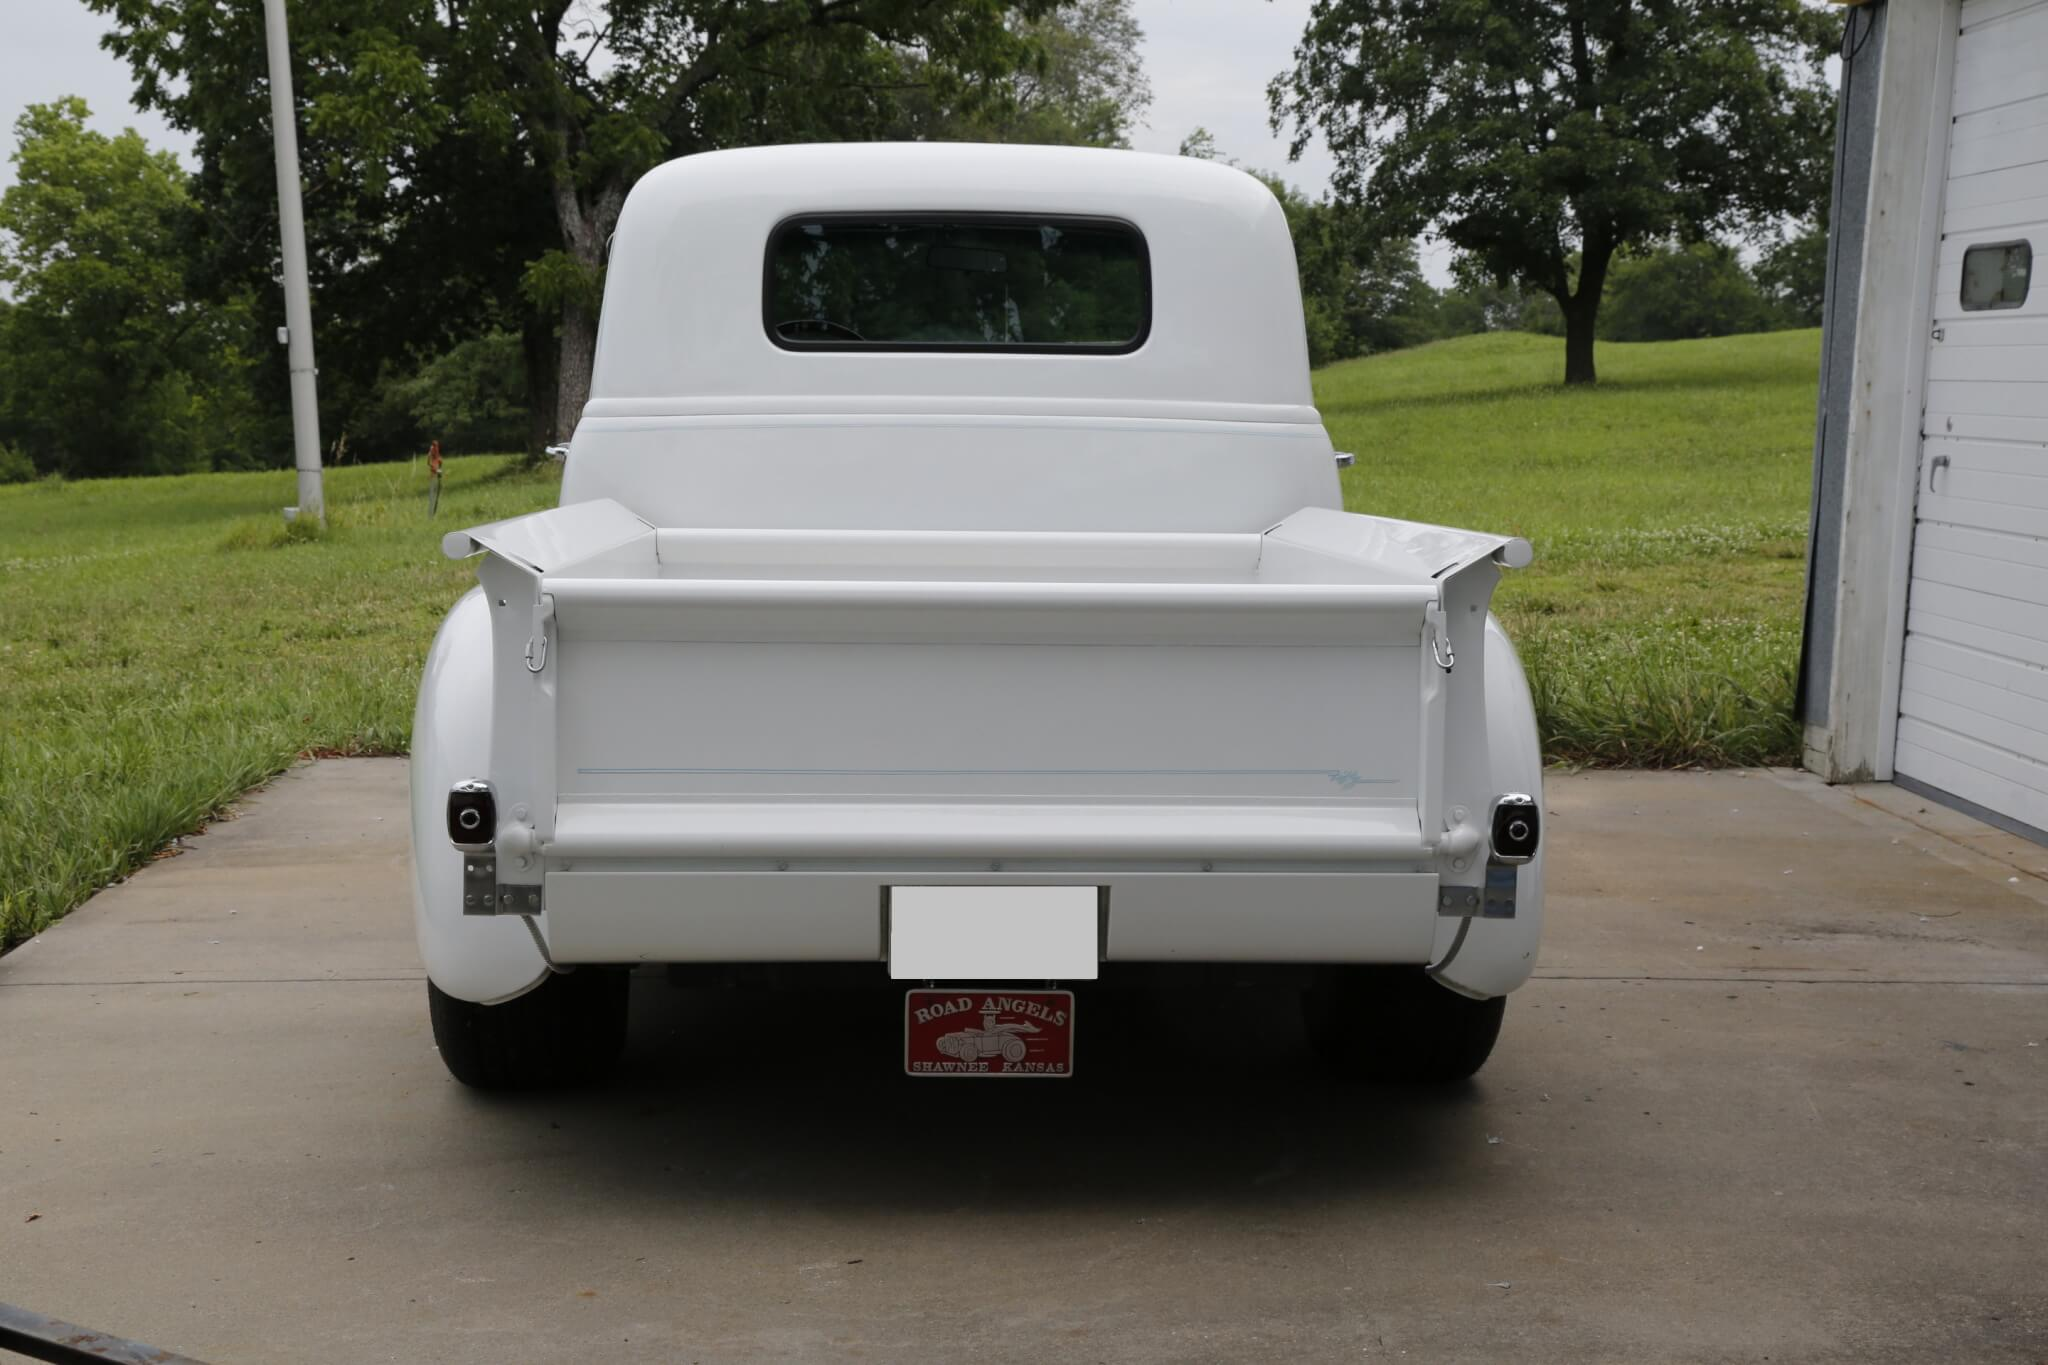 1950 Chevy 3100 - Ed C. - LMC Truck Life